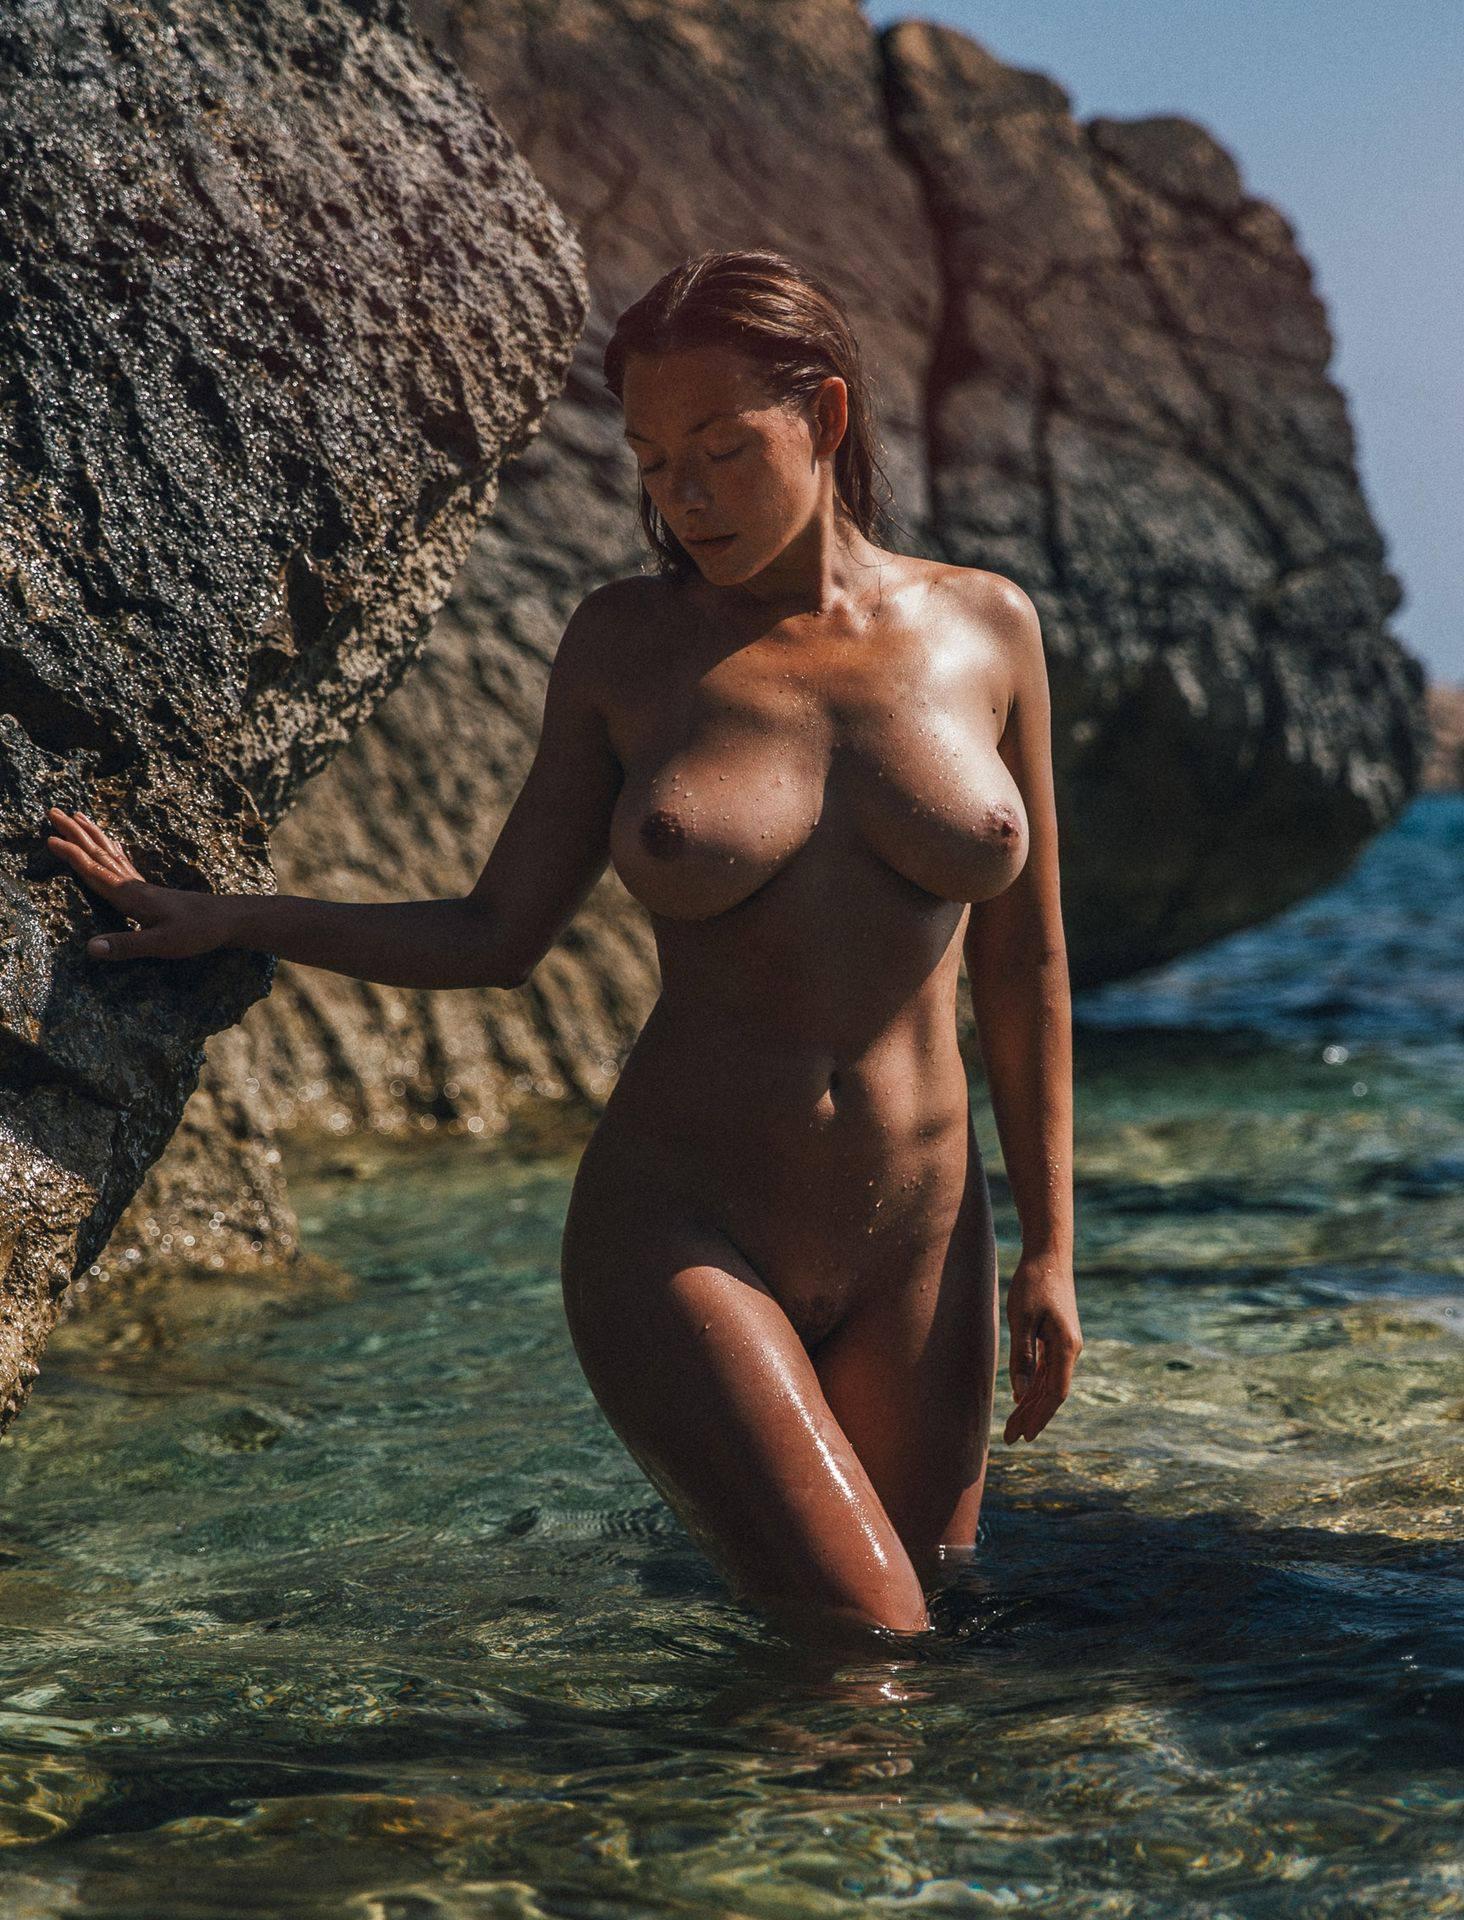 Olga Kobzar – Hot Big Boobs In Sexy Full Frontal Nude Photoshoot By Thomas Agatz (nsfw) 0020